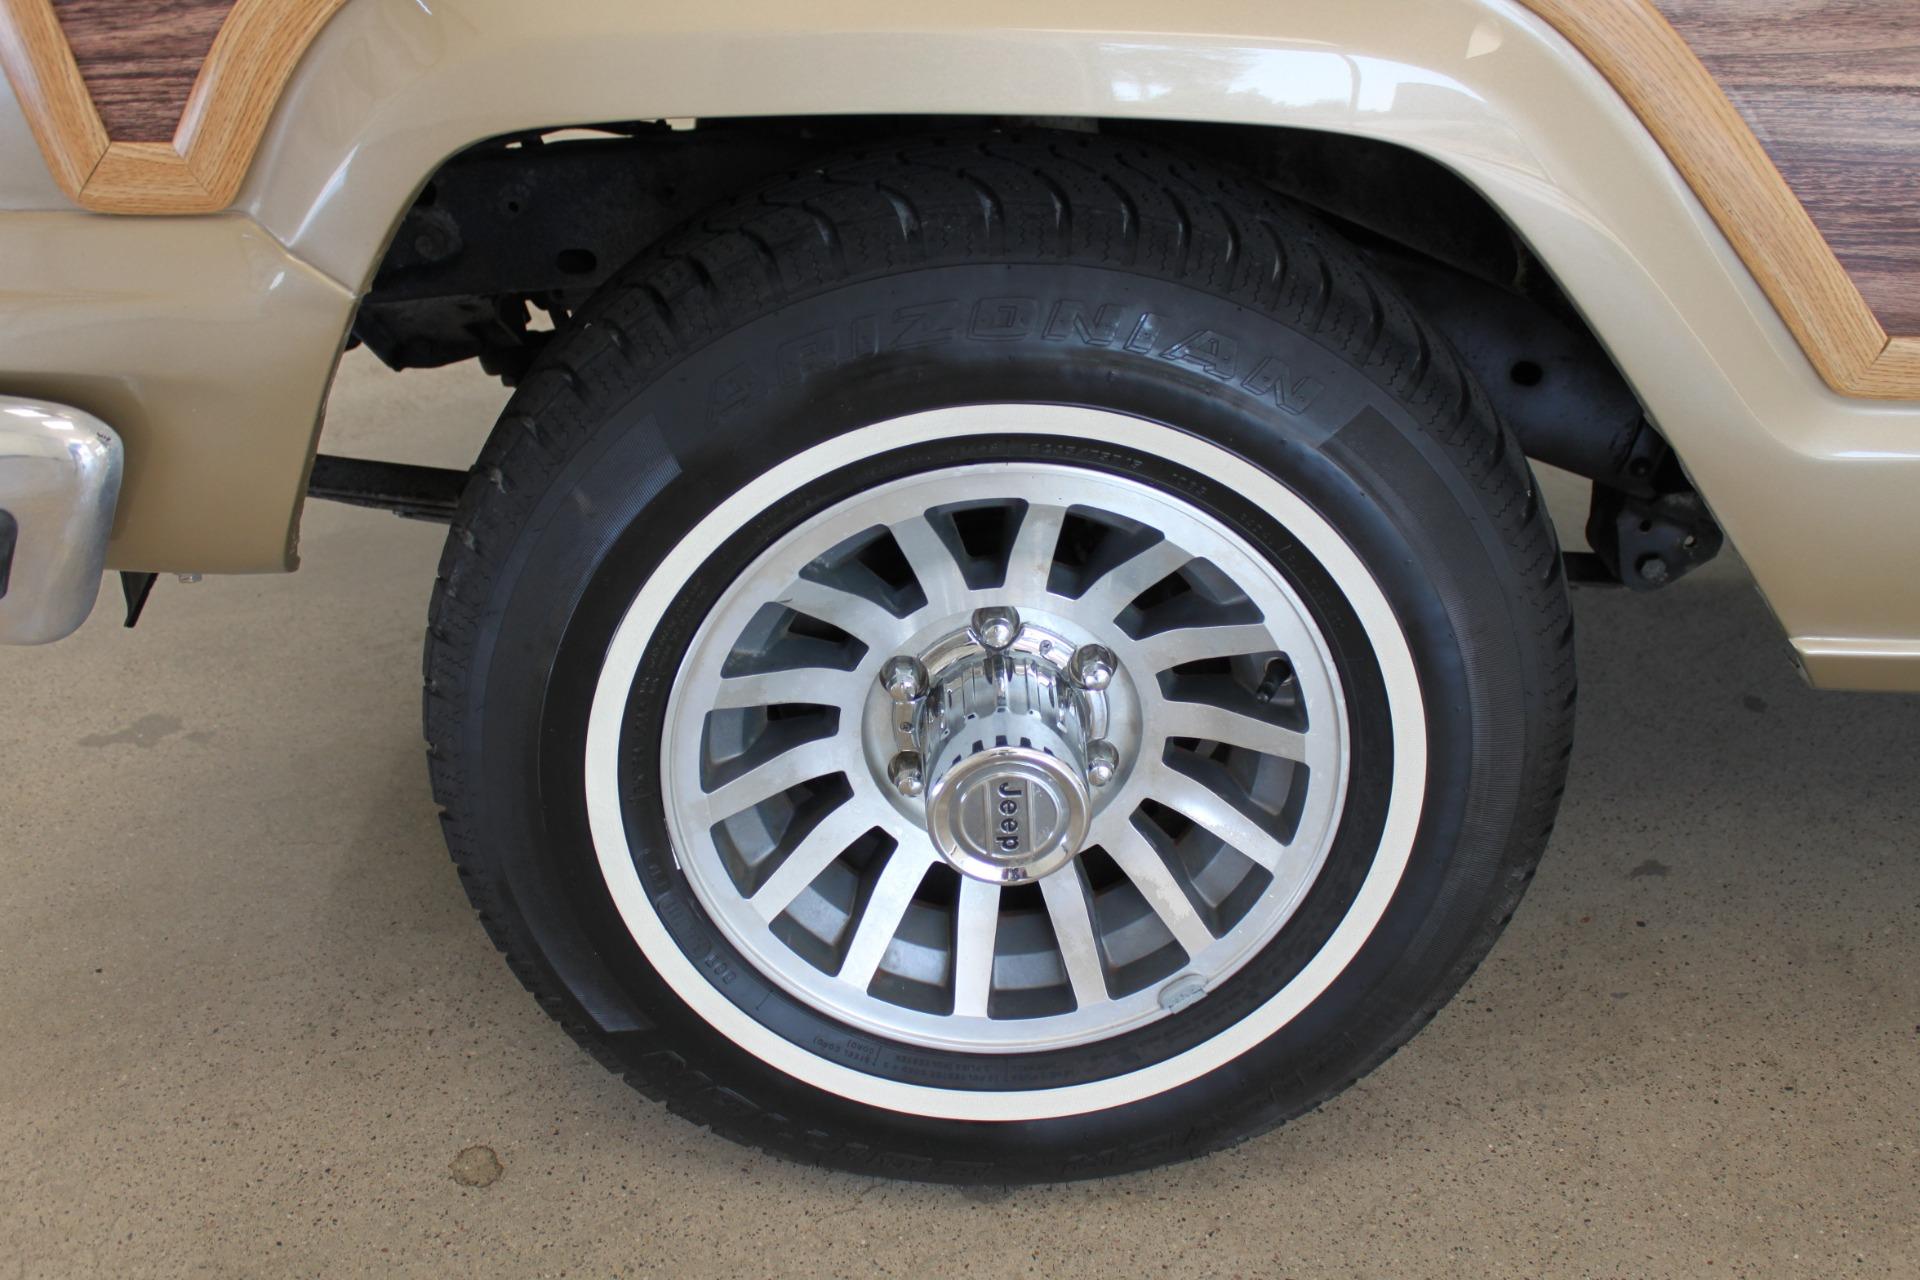 Used-1990-Jeep-Grand-Wagoneer-Chrysler